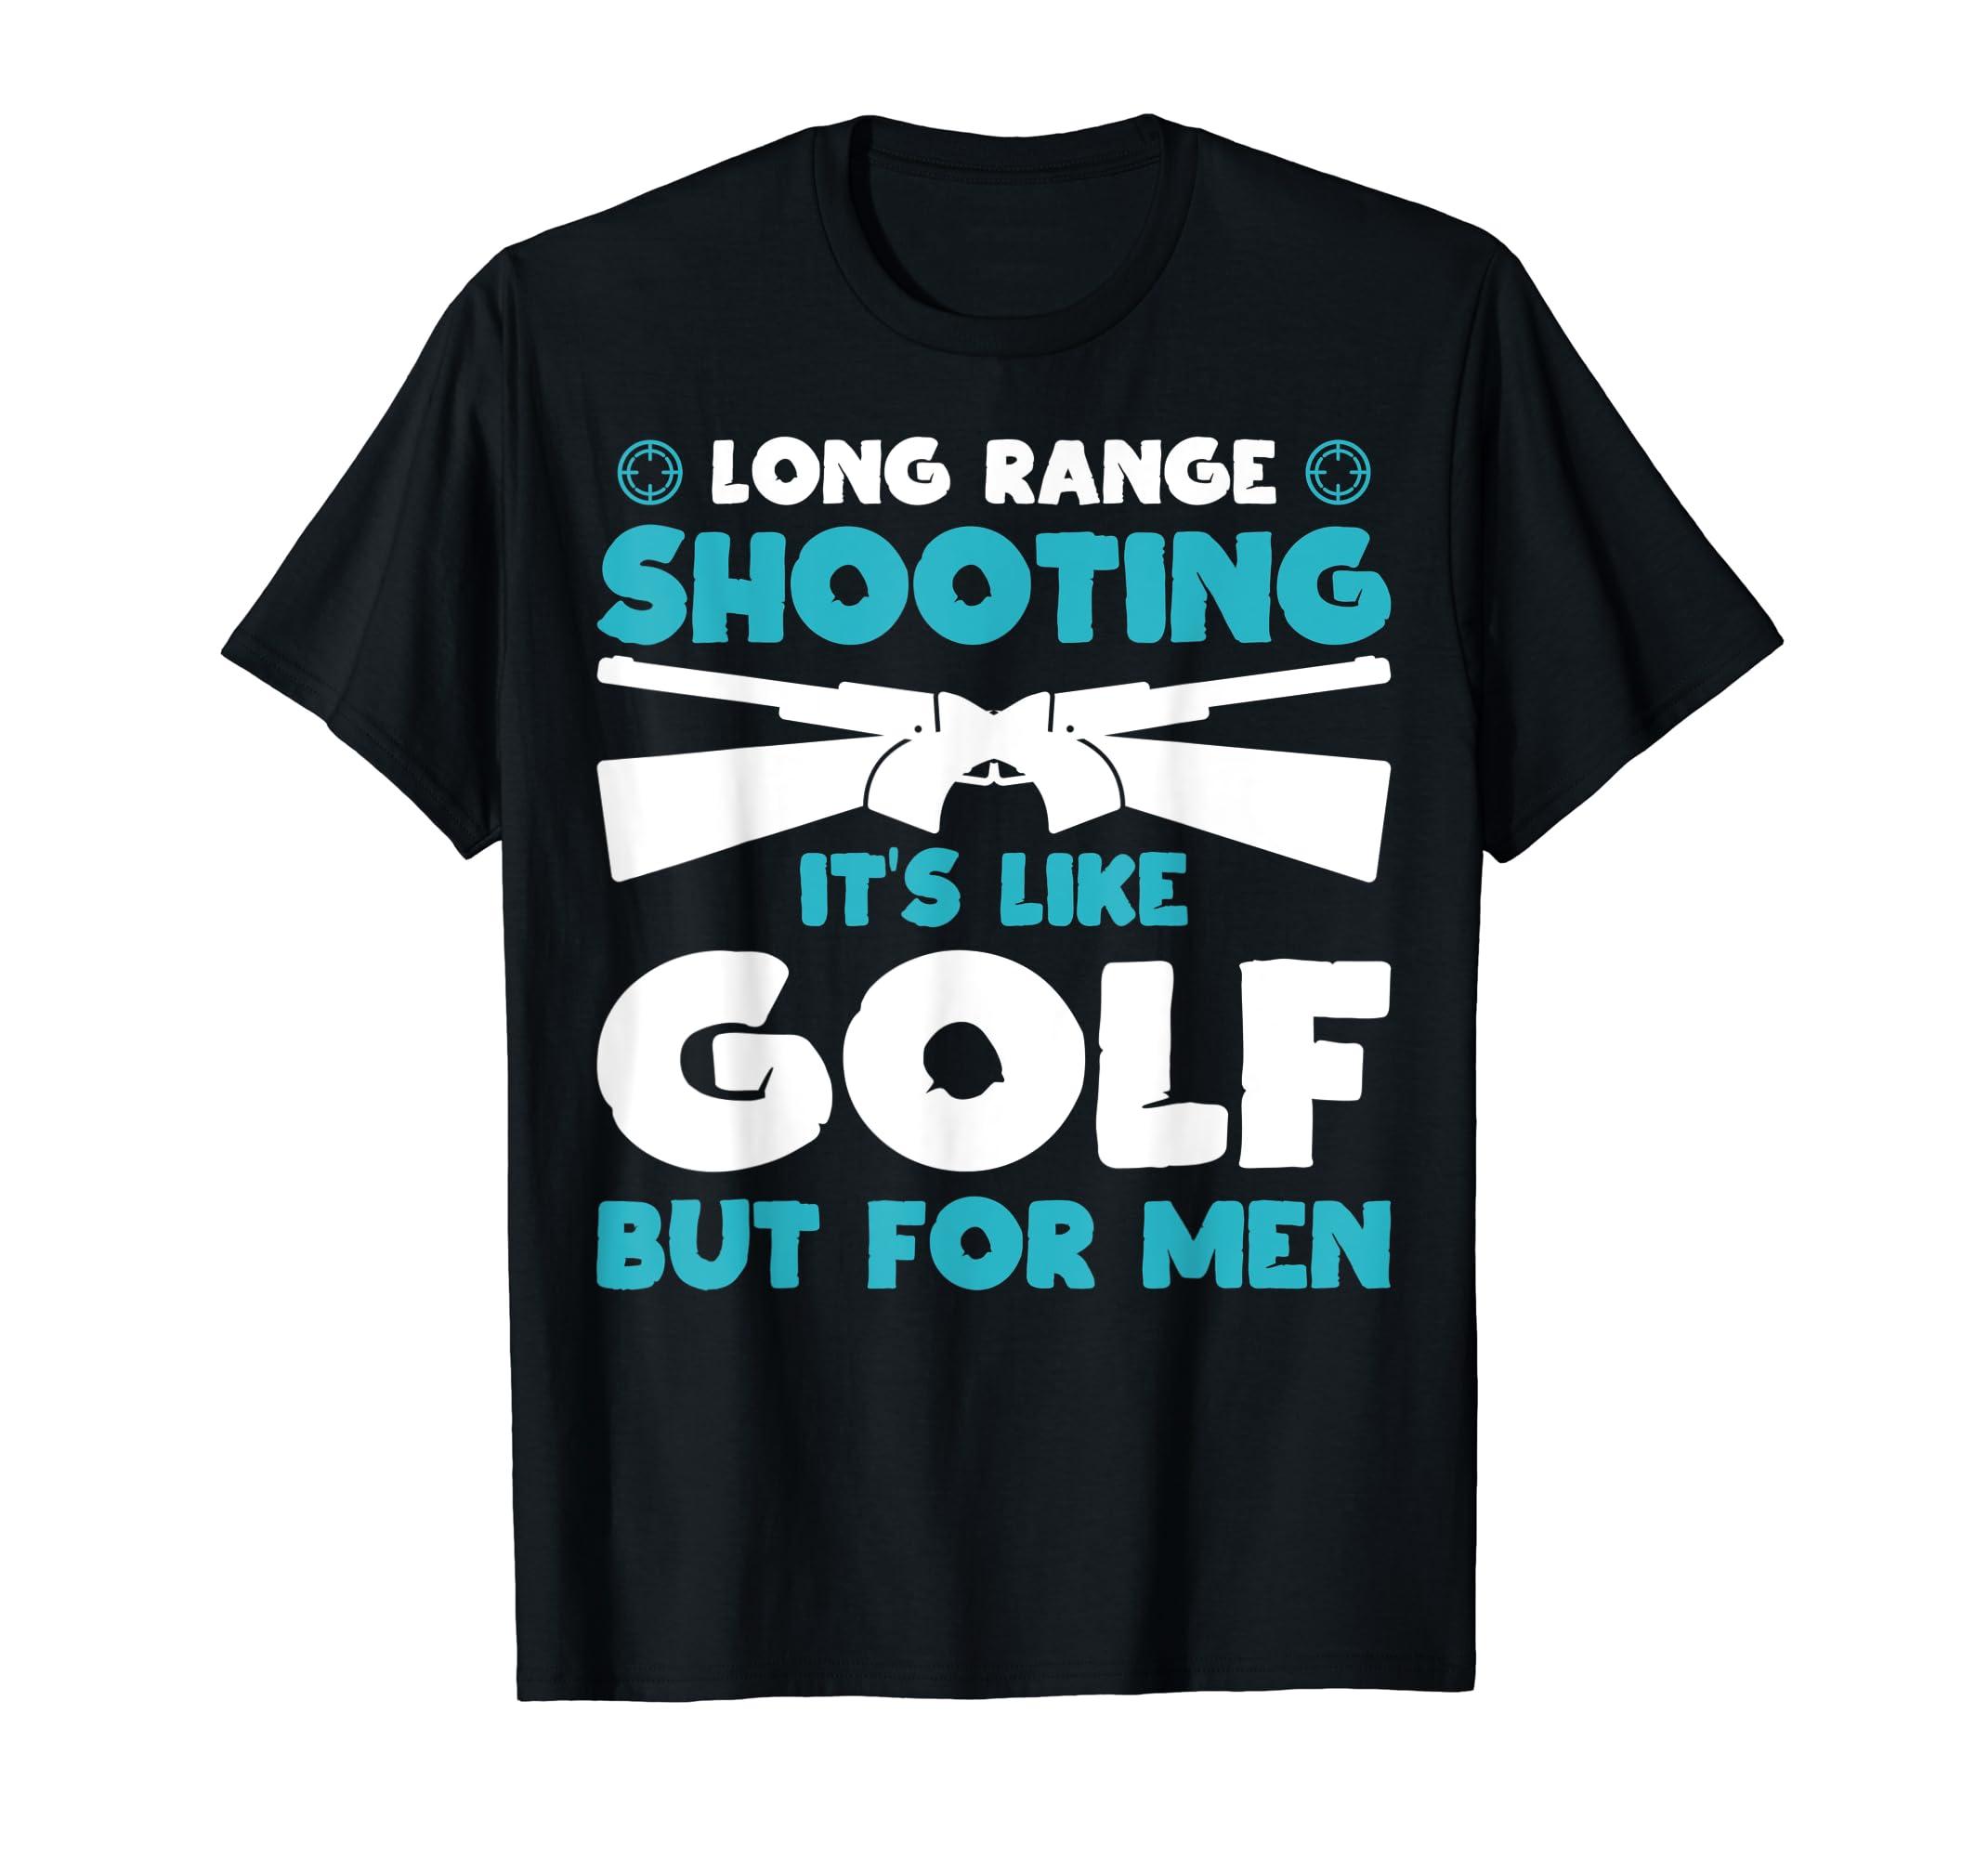 6b2e92567 Amazon.com: Mens LONG RANGE SHOOTING IT'S LIKE GOLF BUT FOR MEN T-Shirt:  Clothing